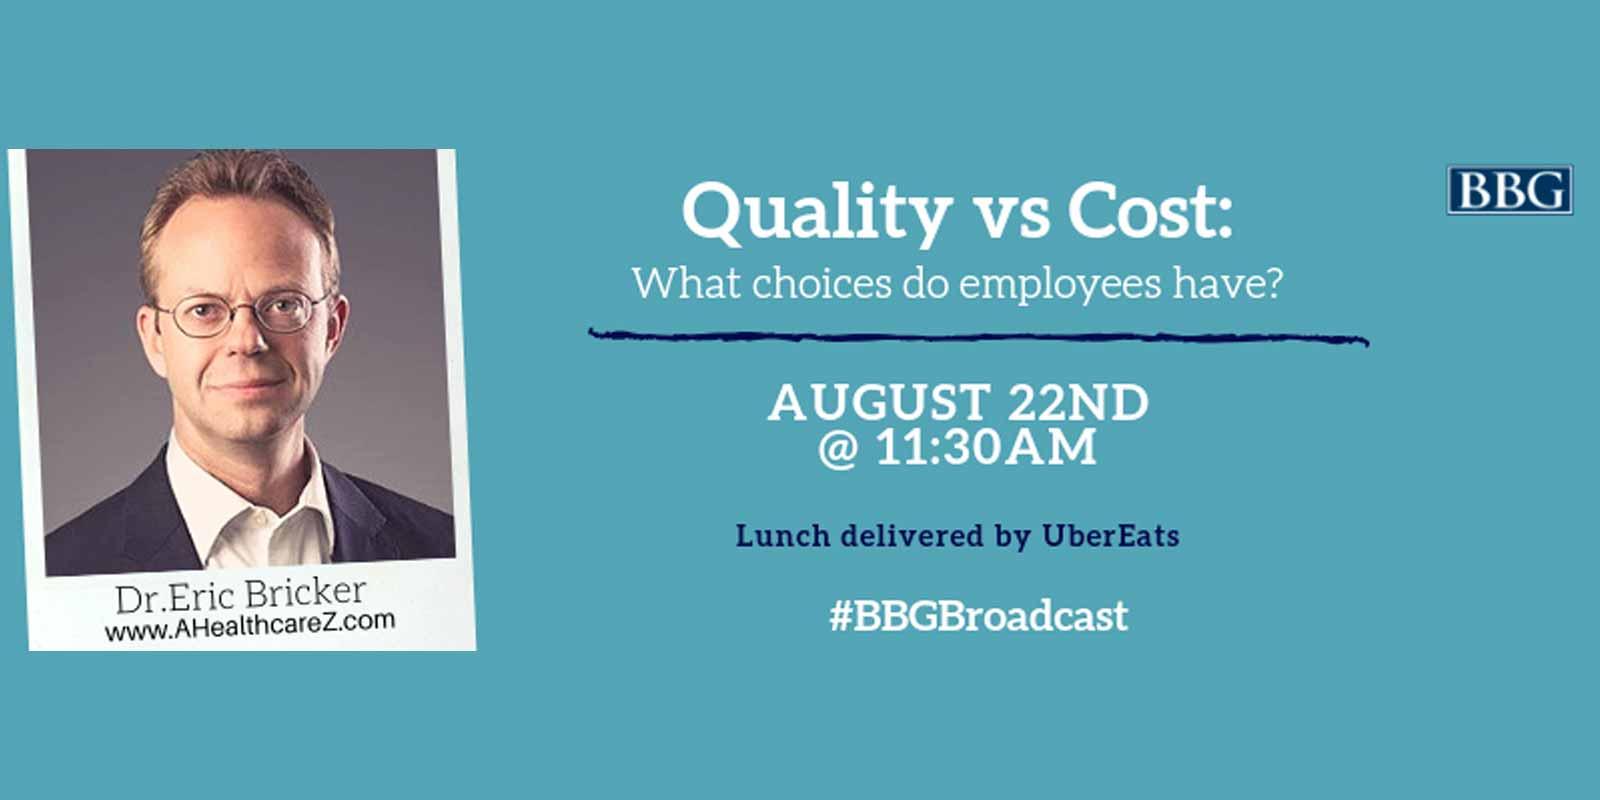 bbg-quality-vs-cost-webinar-banner